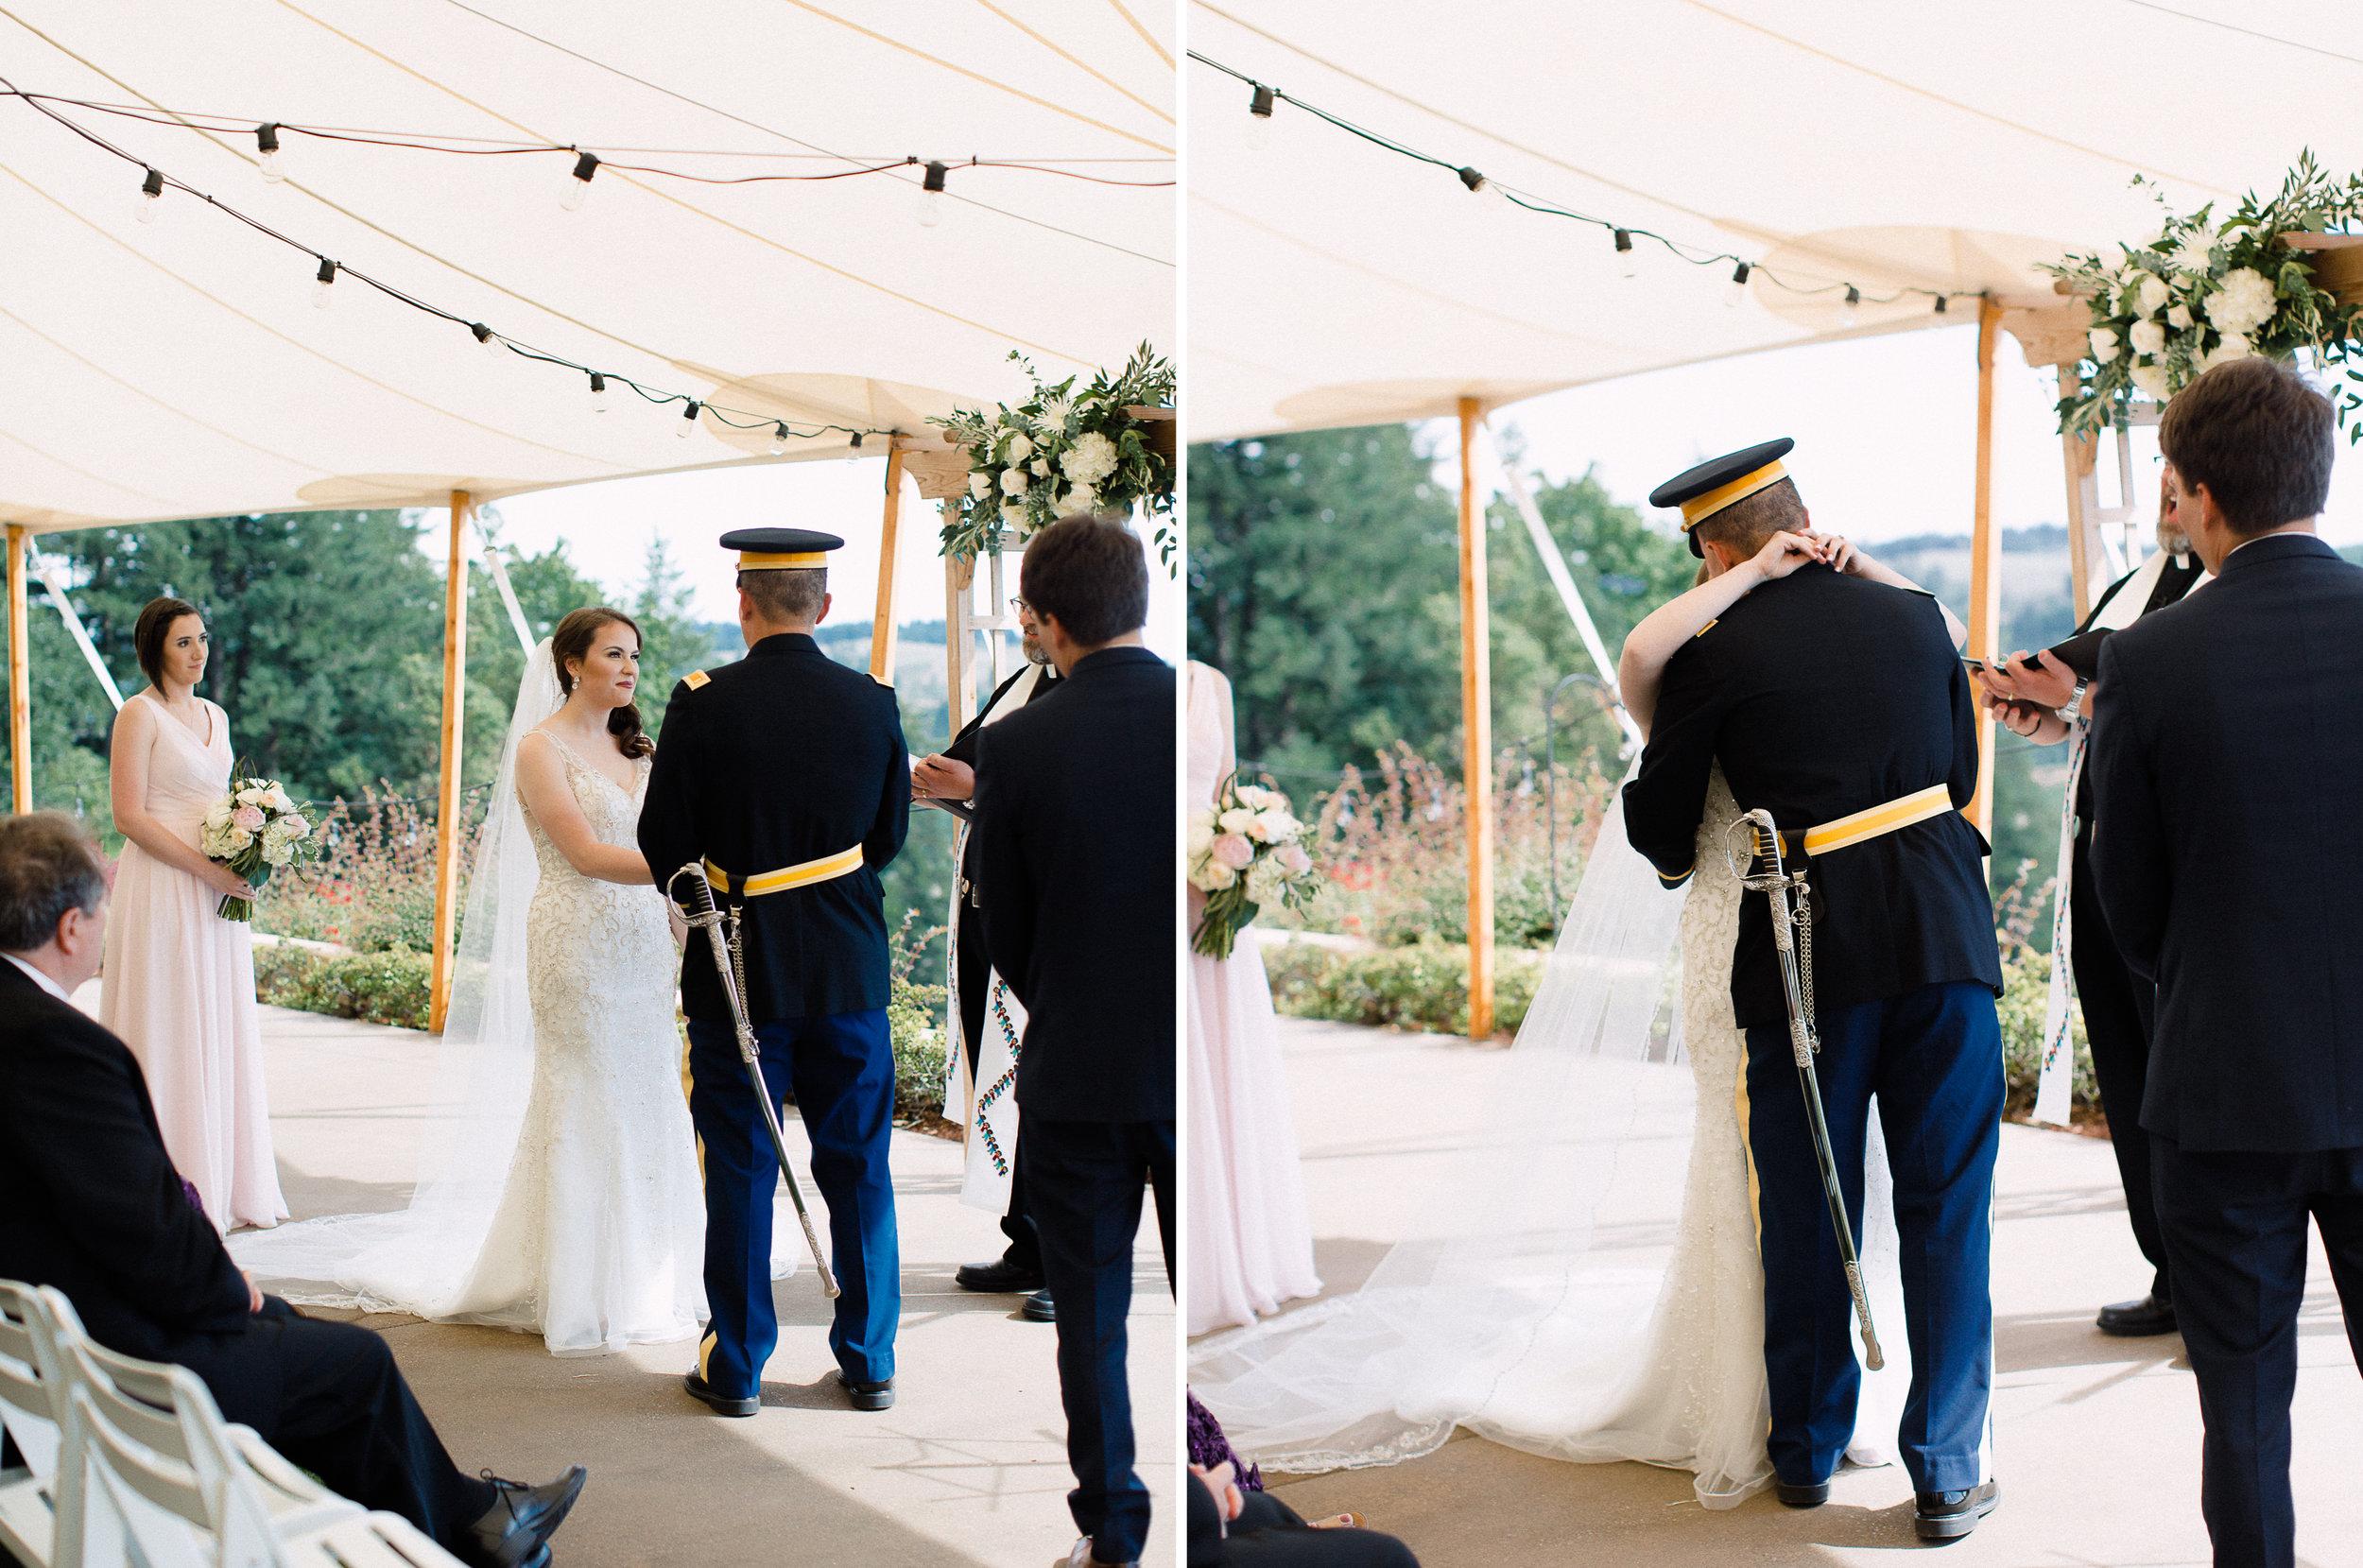 romantic-willamette-valley-vineyard-wedding-15.jpg